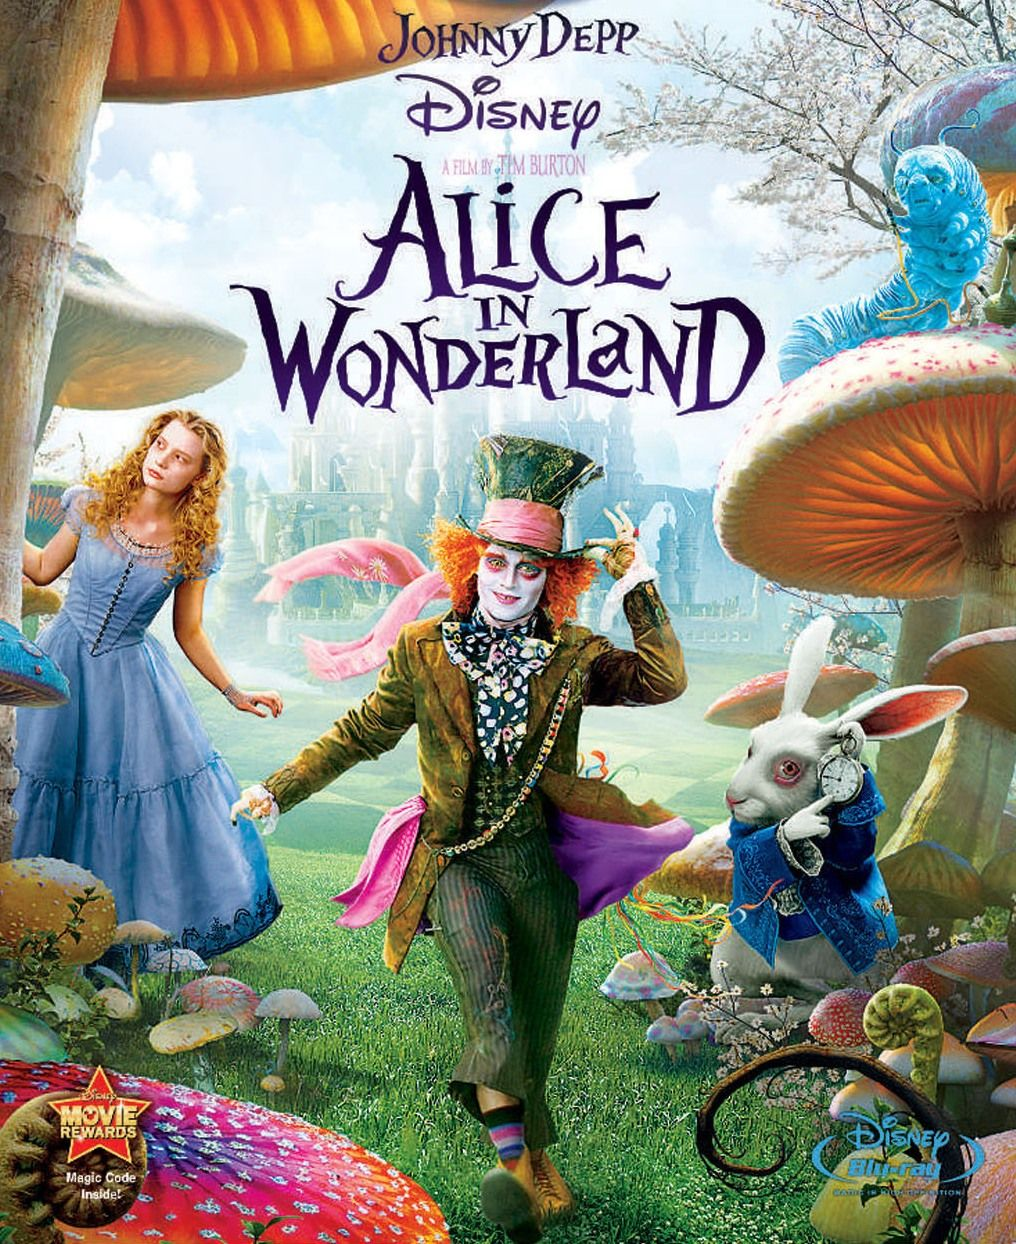 Alice In Wonderland Hd Wallpapers Backgrounds Wallpaper 1280 1024